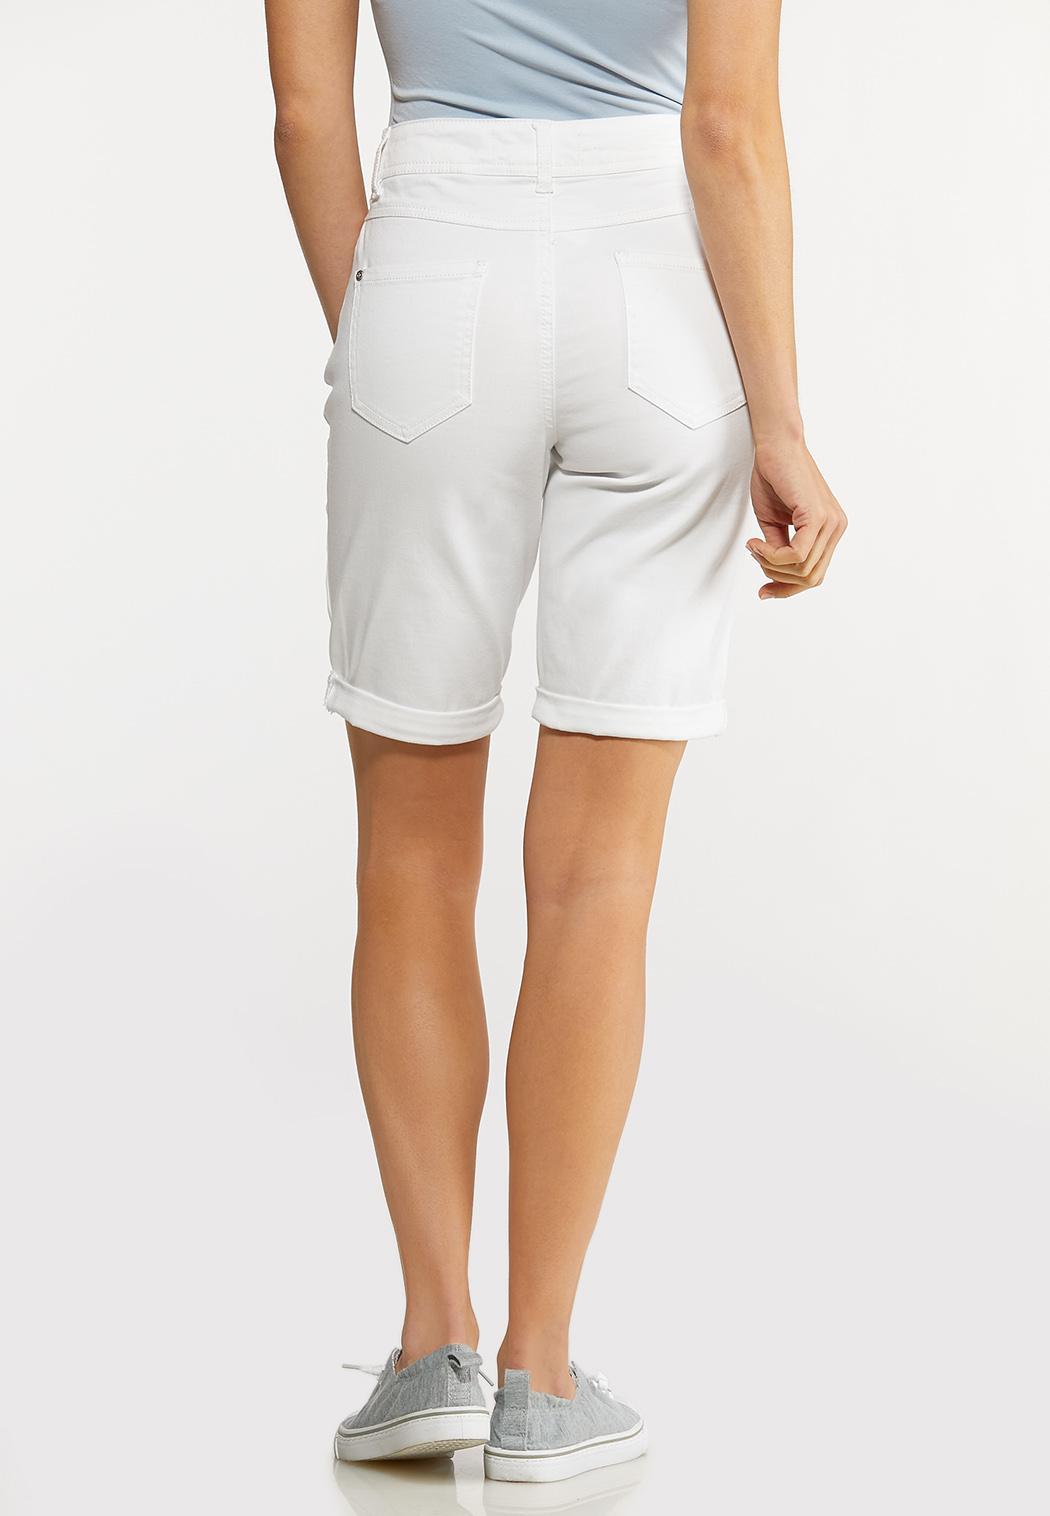 White Jean Shorts (Item #44142180)